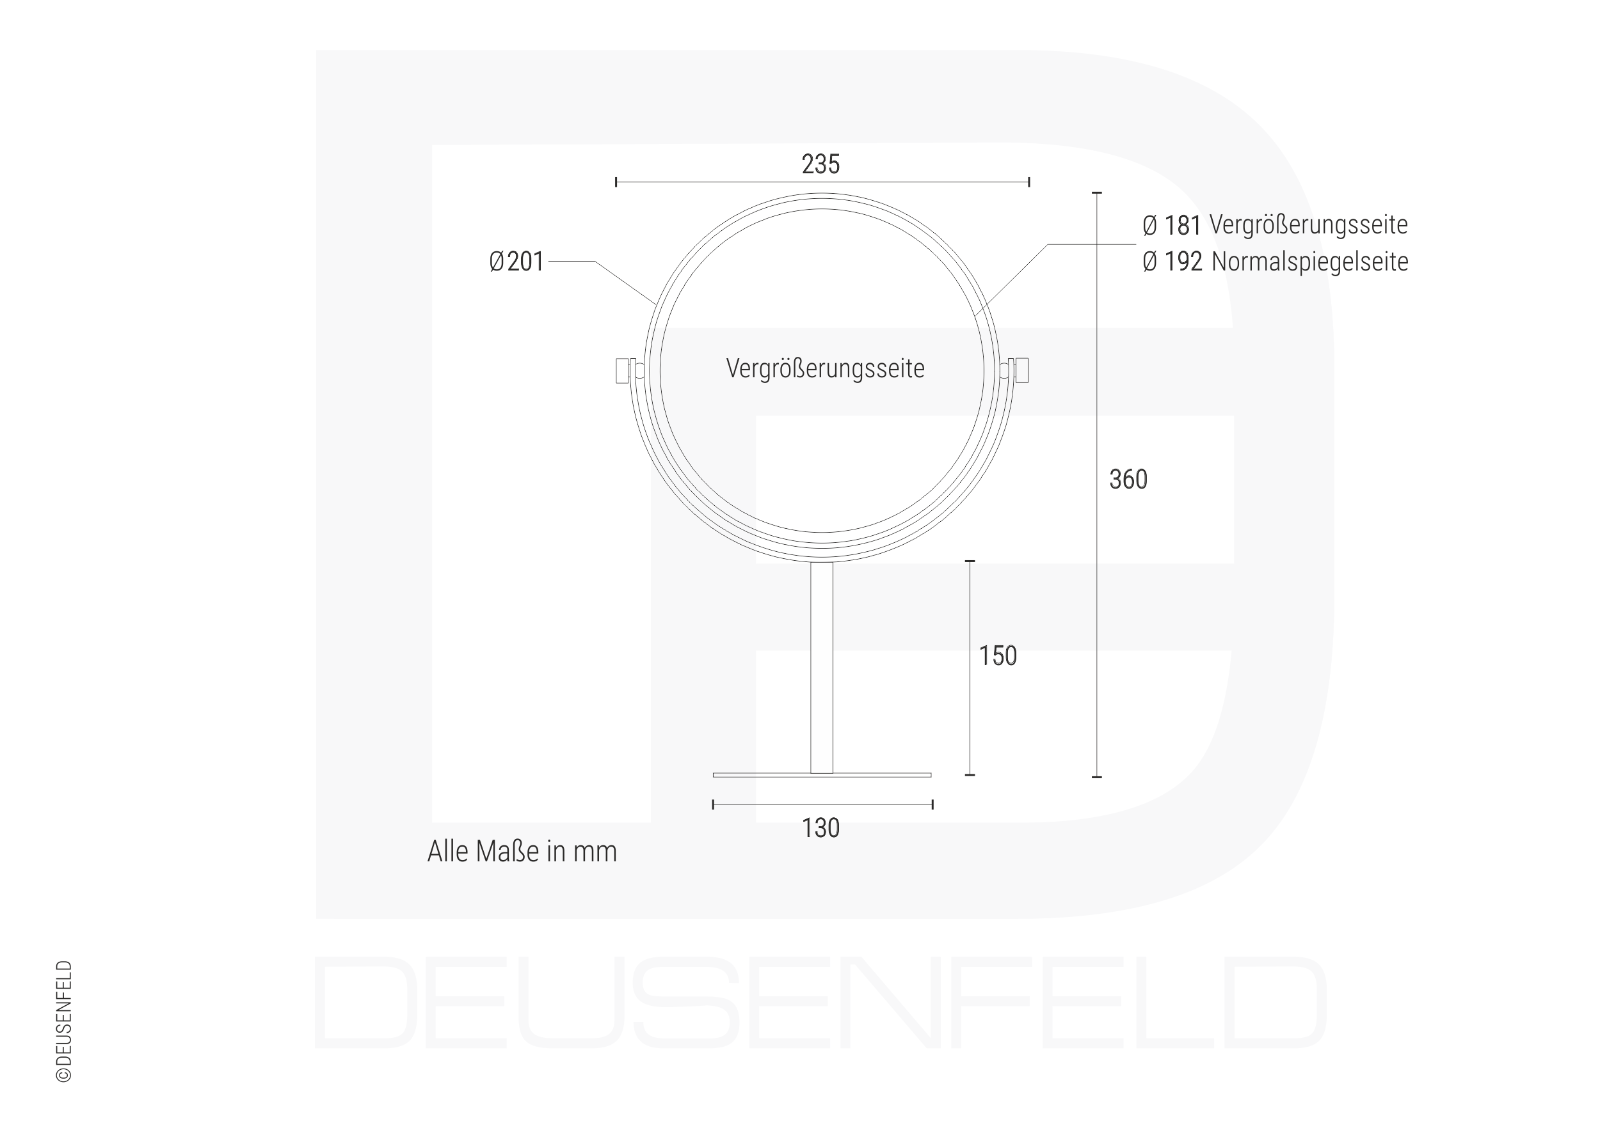 Deusenfeld sk520-doble stand cosméticos agrandamiento espejo, 5x agrandamiento cosméticos + normal, ø20cm c9dbfc